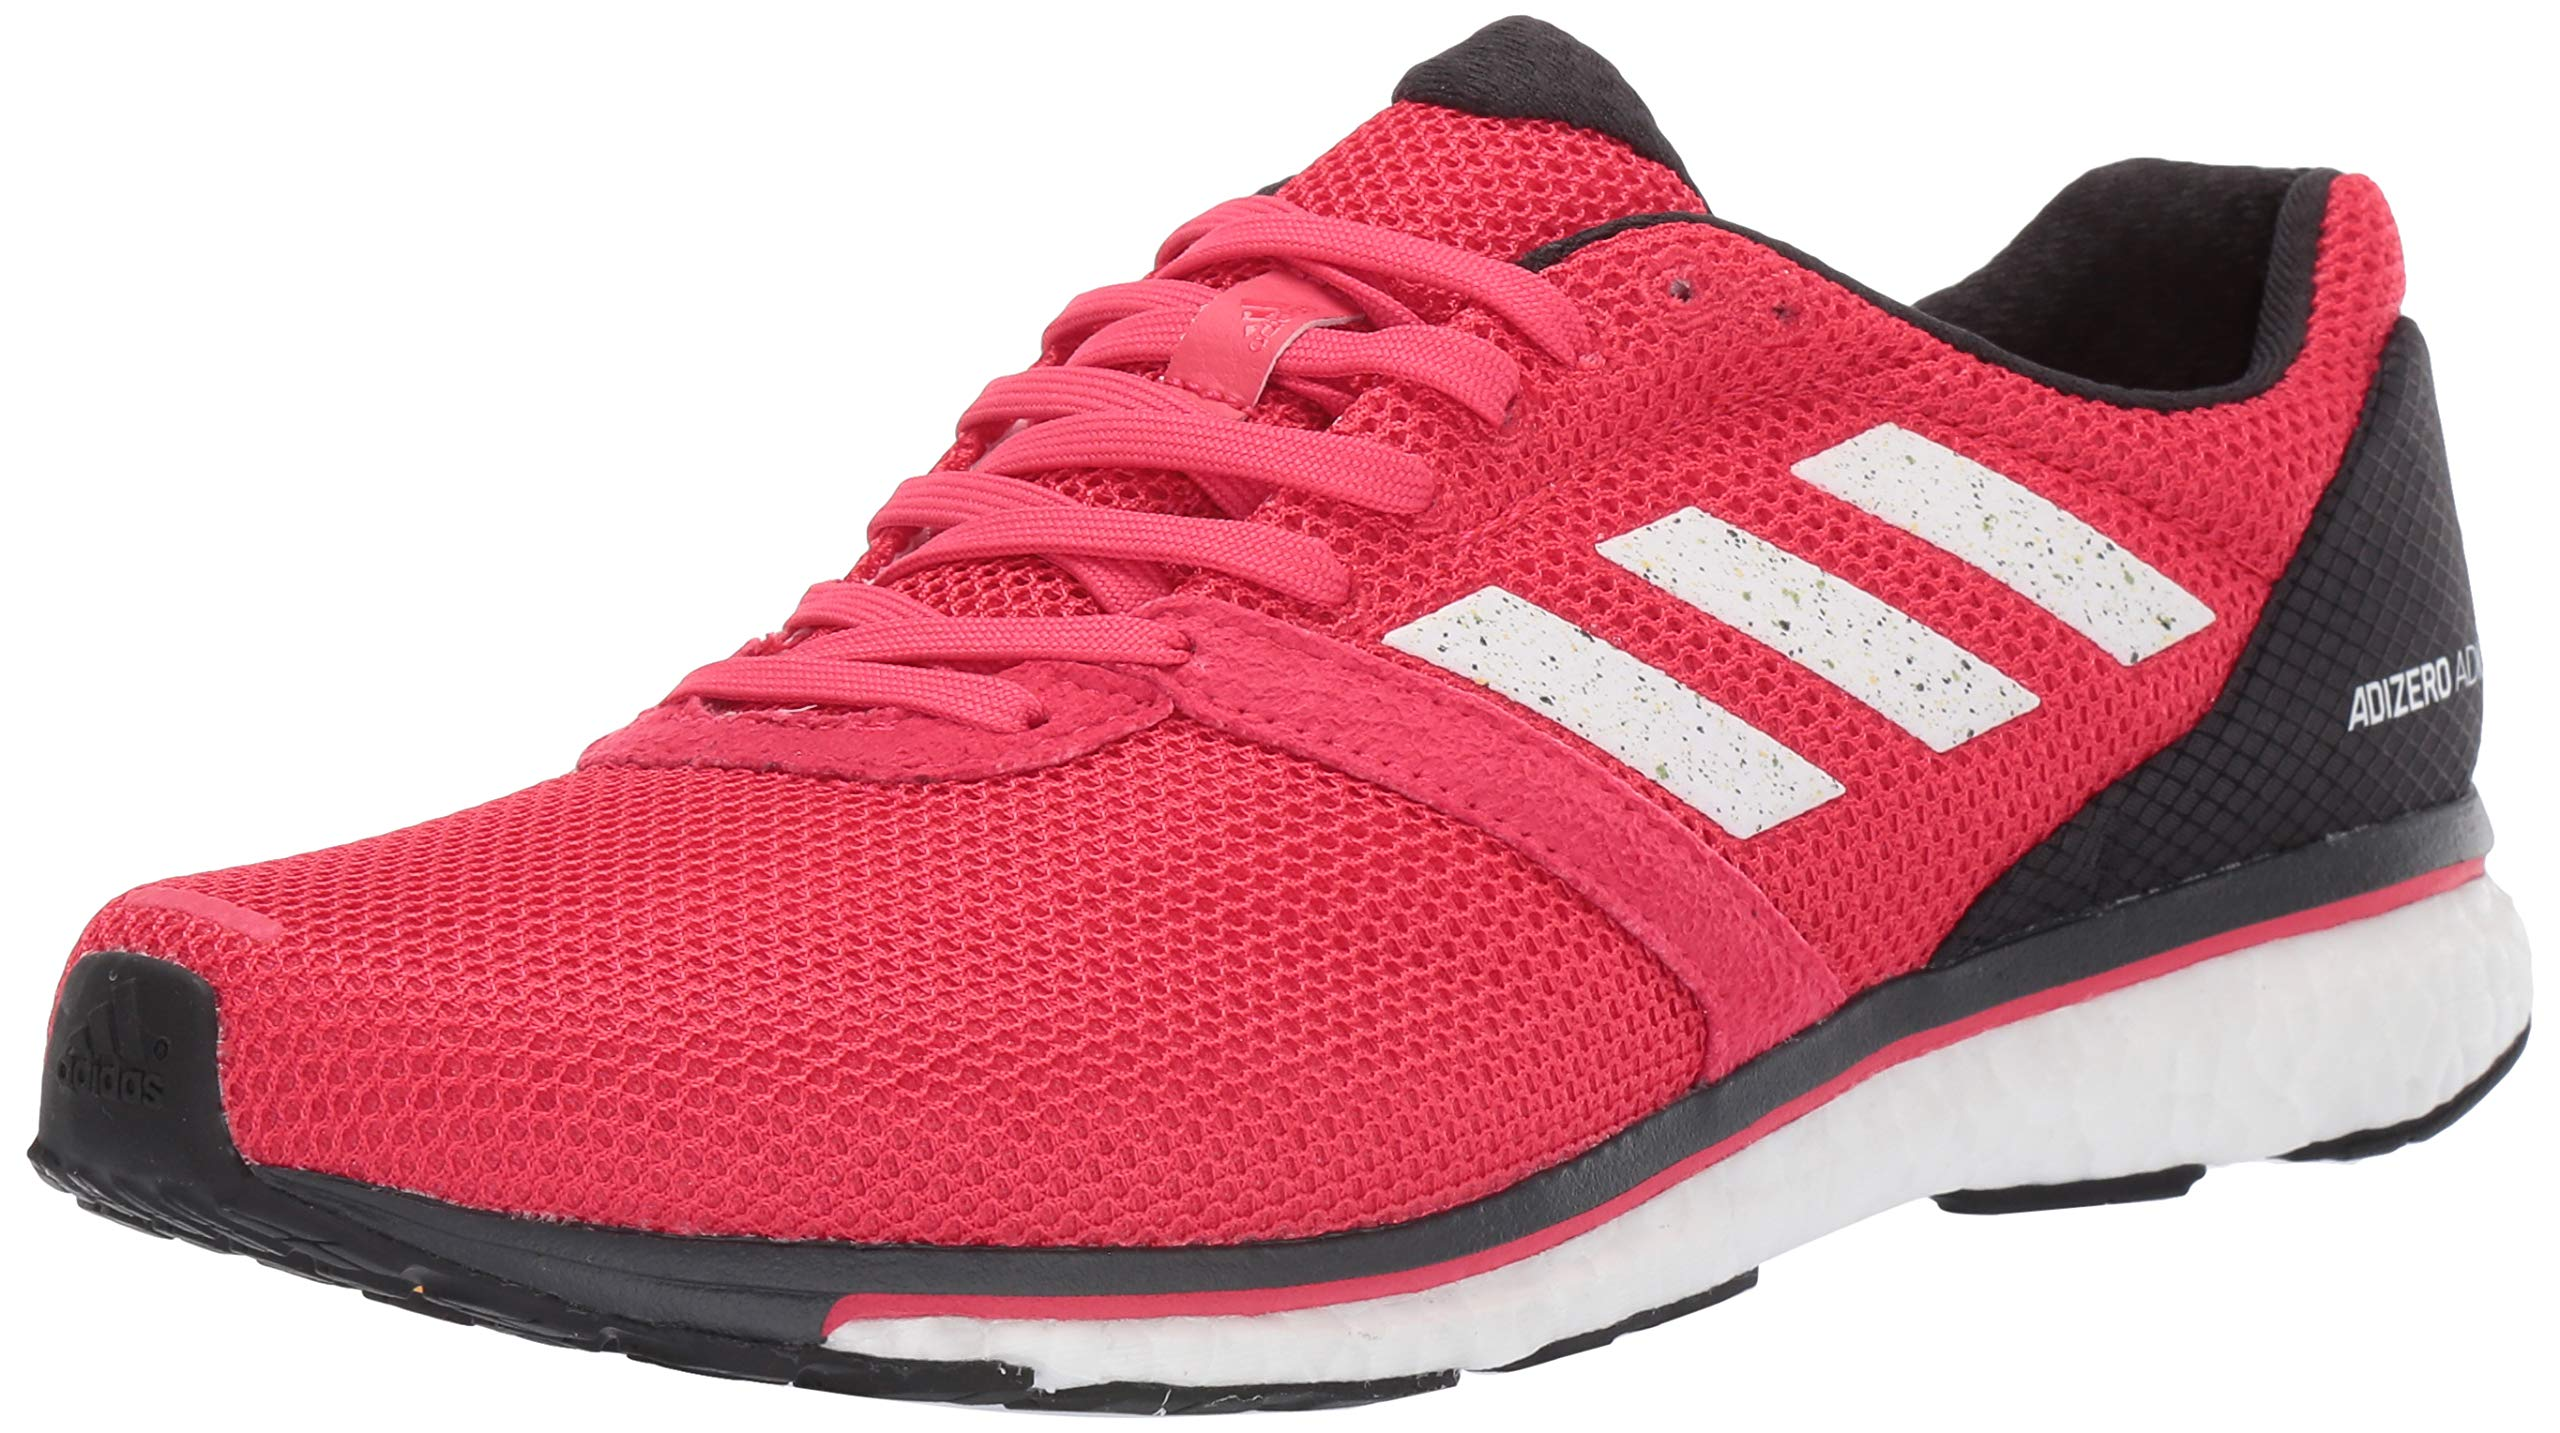 adidas Men's Adizero Adios 4, Active Pink/White/Carbon, 11 M US by adidas